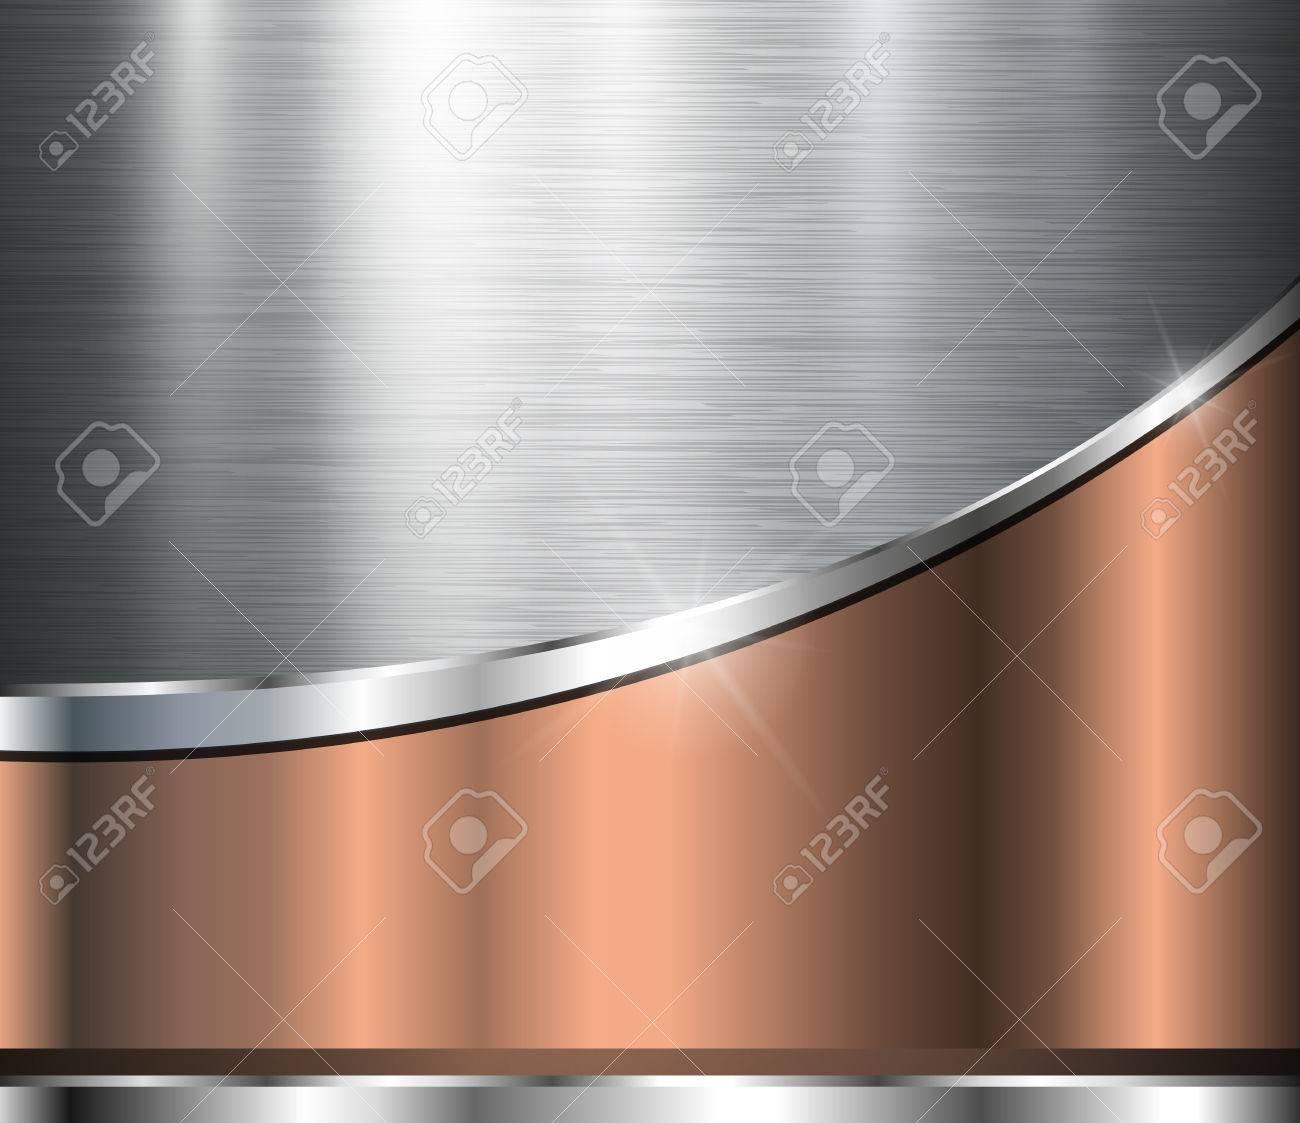 Metallic background polished steel texture, vector design. - 49361624